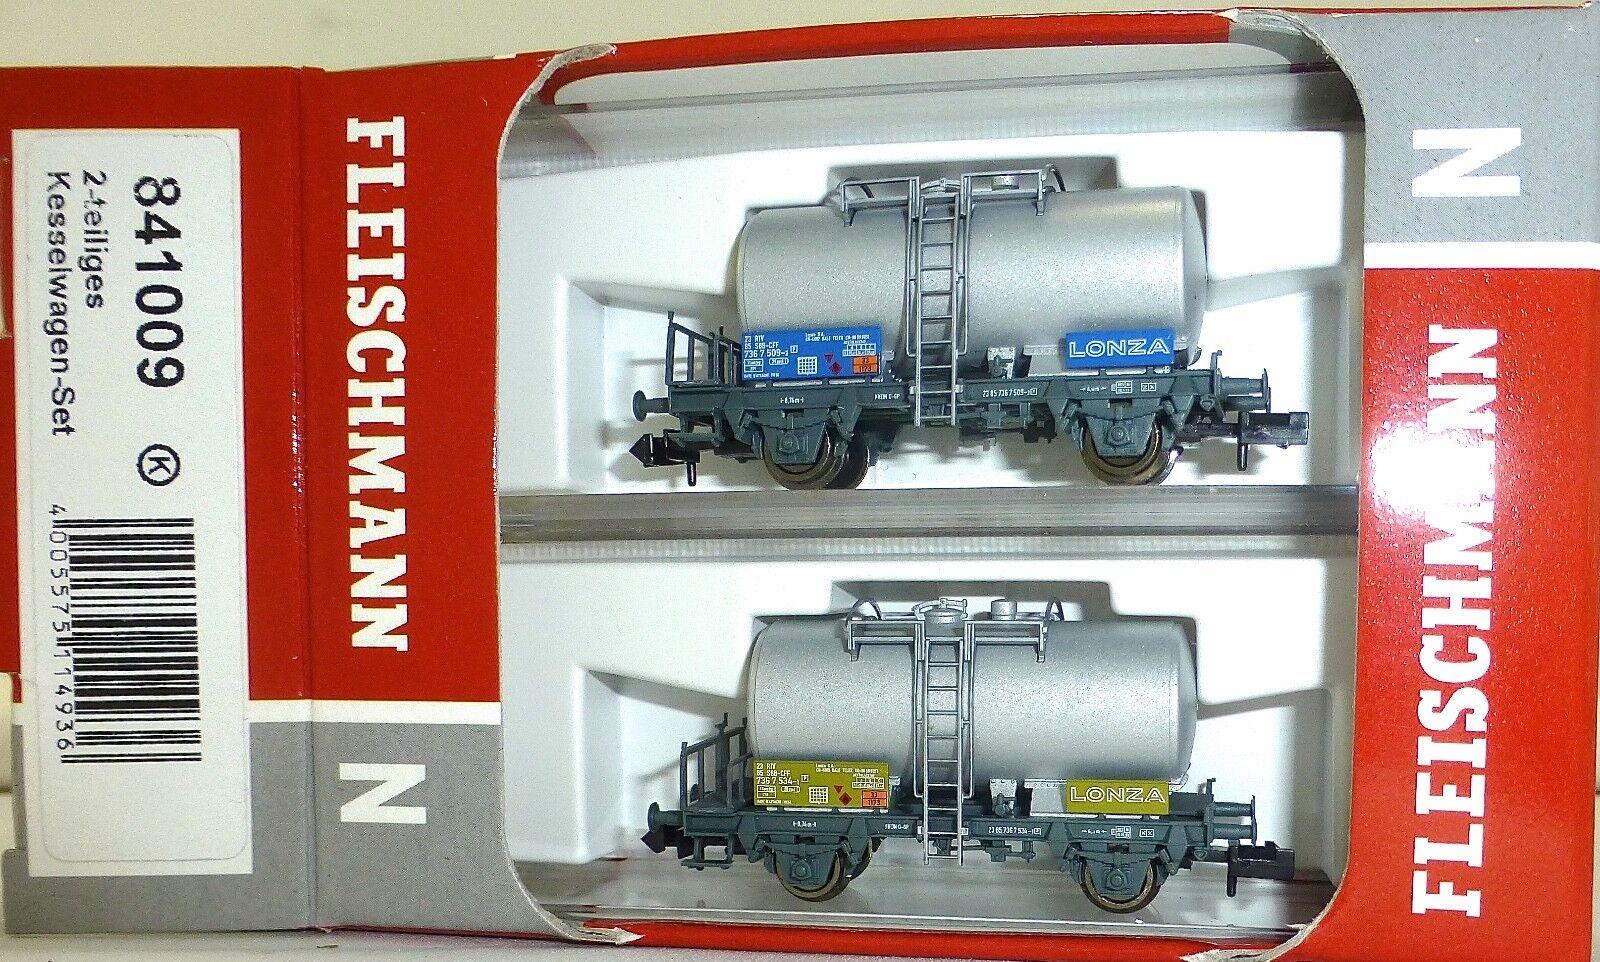 SBB lonza 2tlg vagones set Fleischmann 841009 n 1 160 OVP nuevo hq3 µg